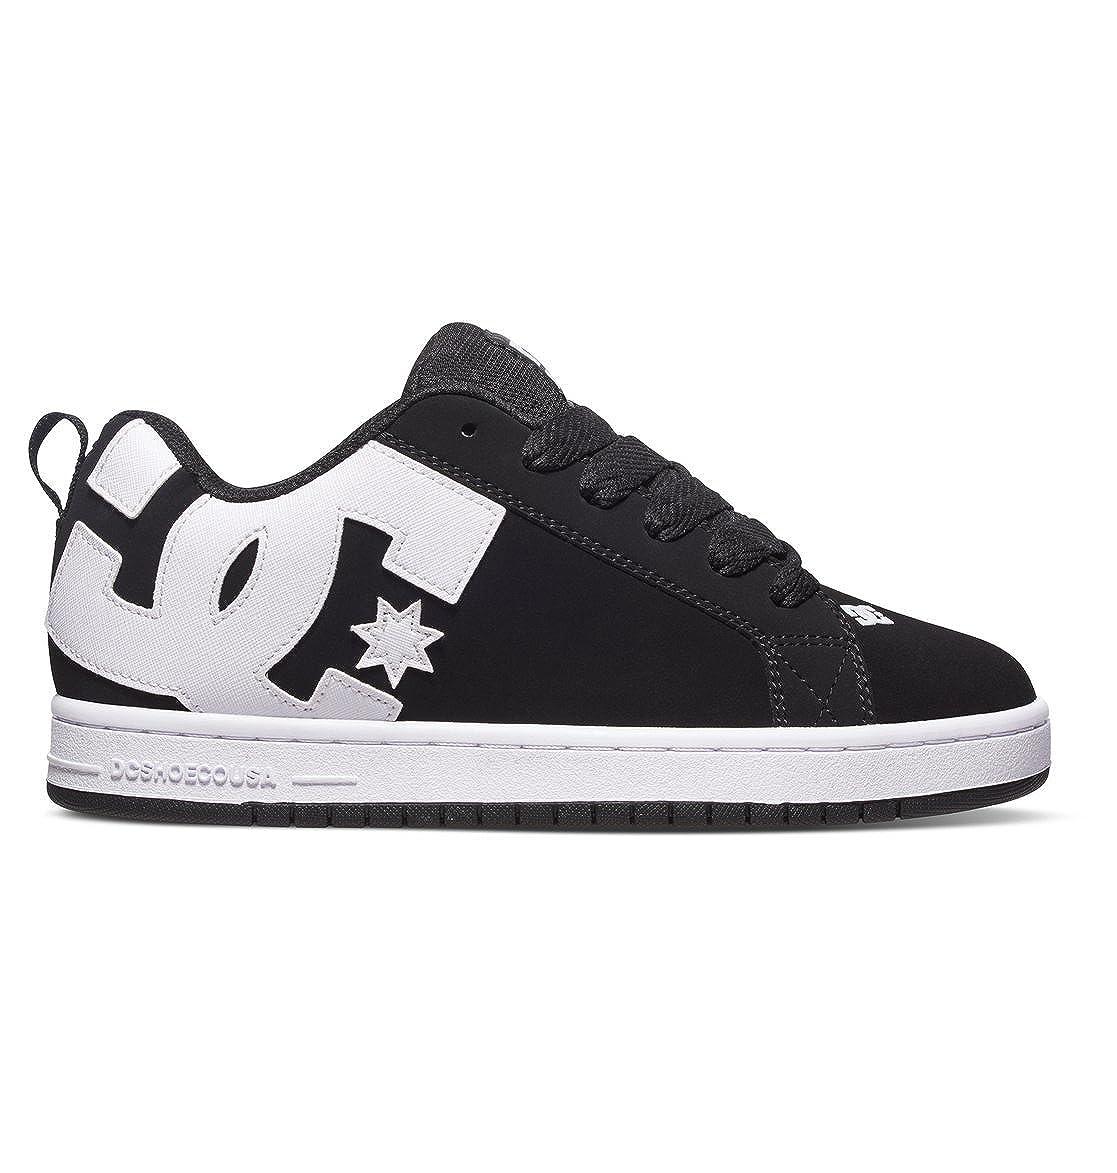 Zapatillas de Piel Vuelta Unisex Adulto Talla 43 EU Color Negro DC Shoes D0300927